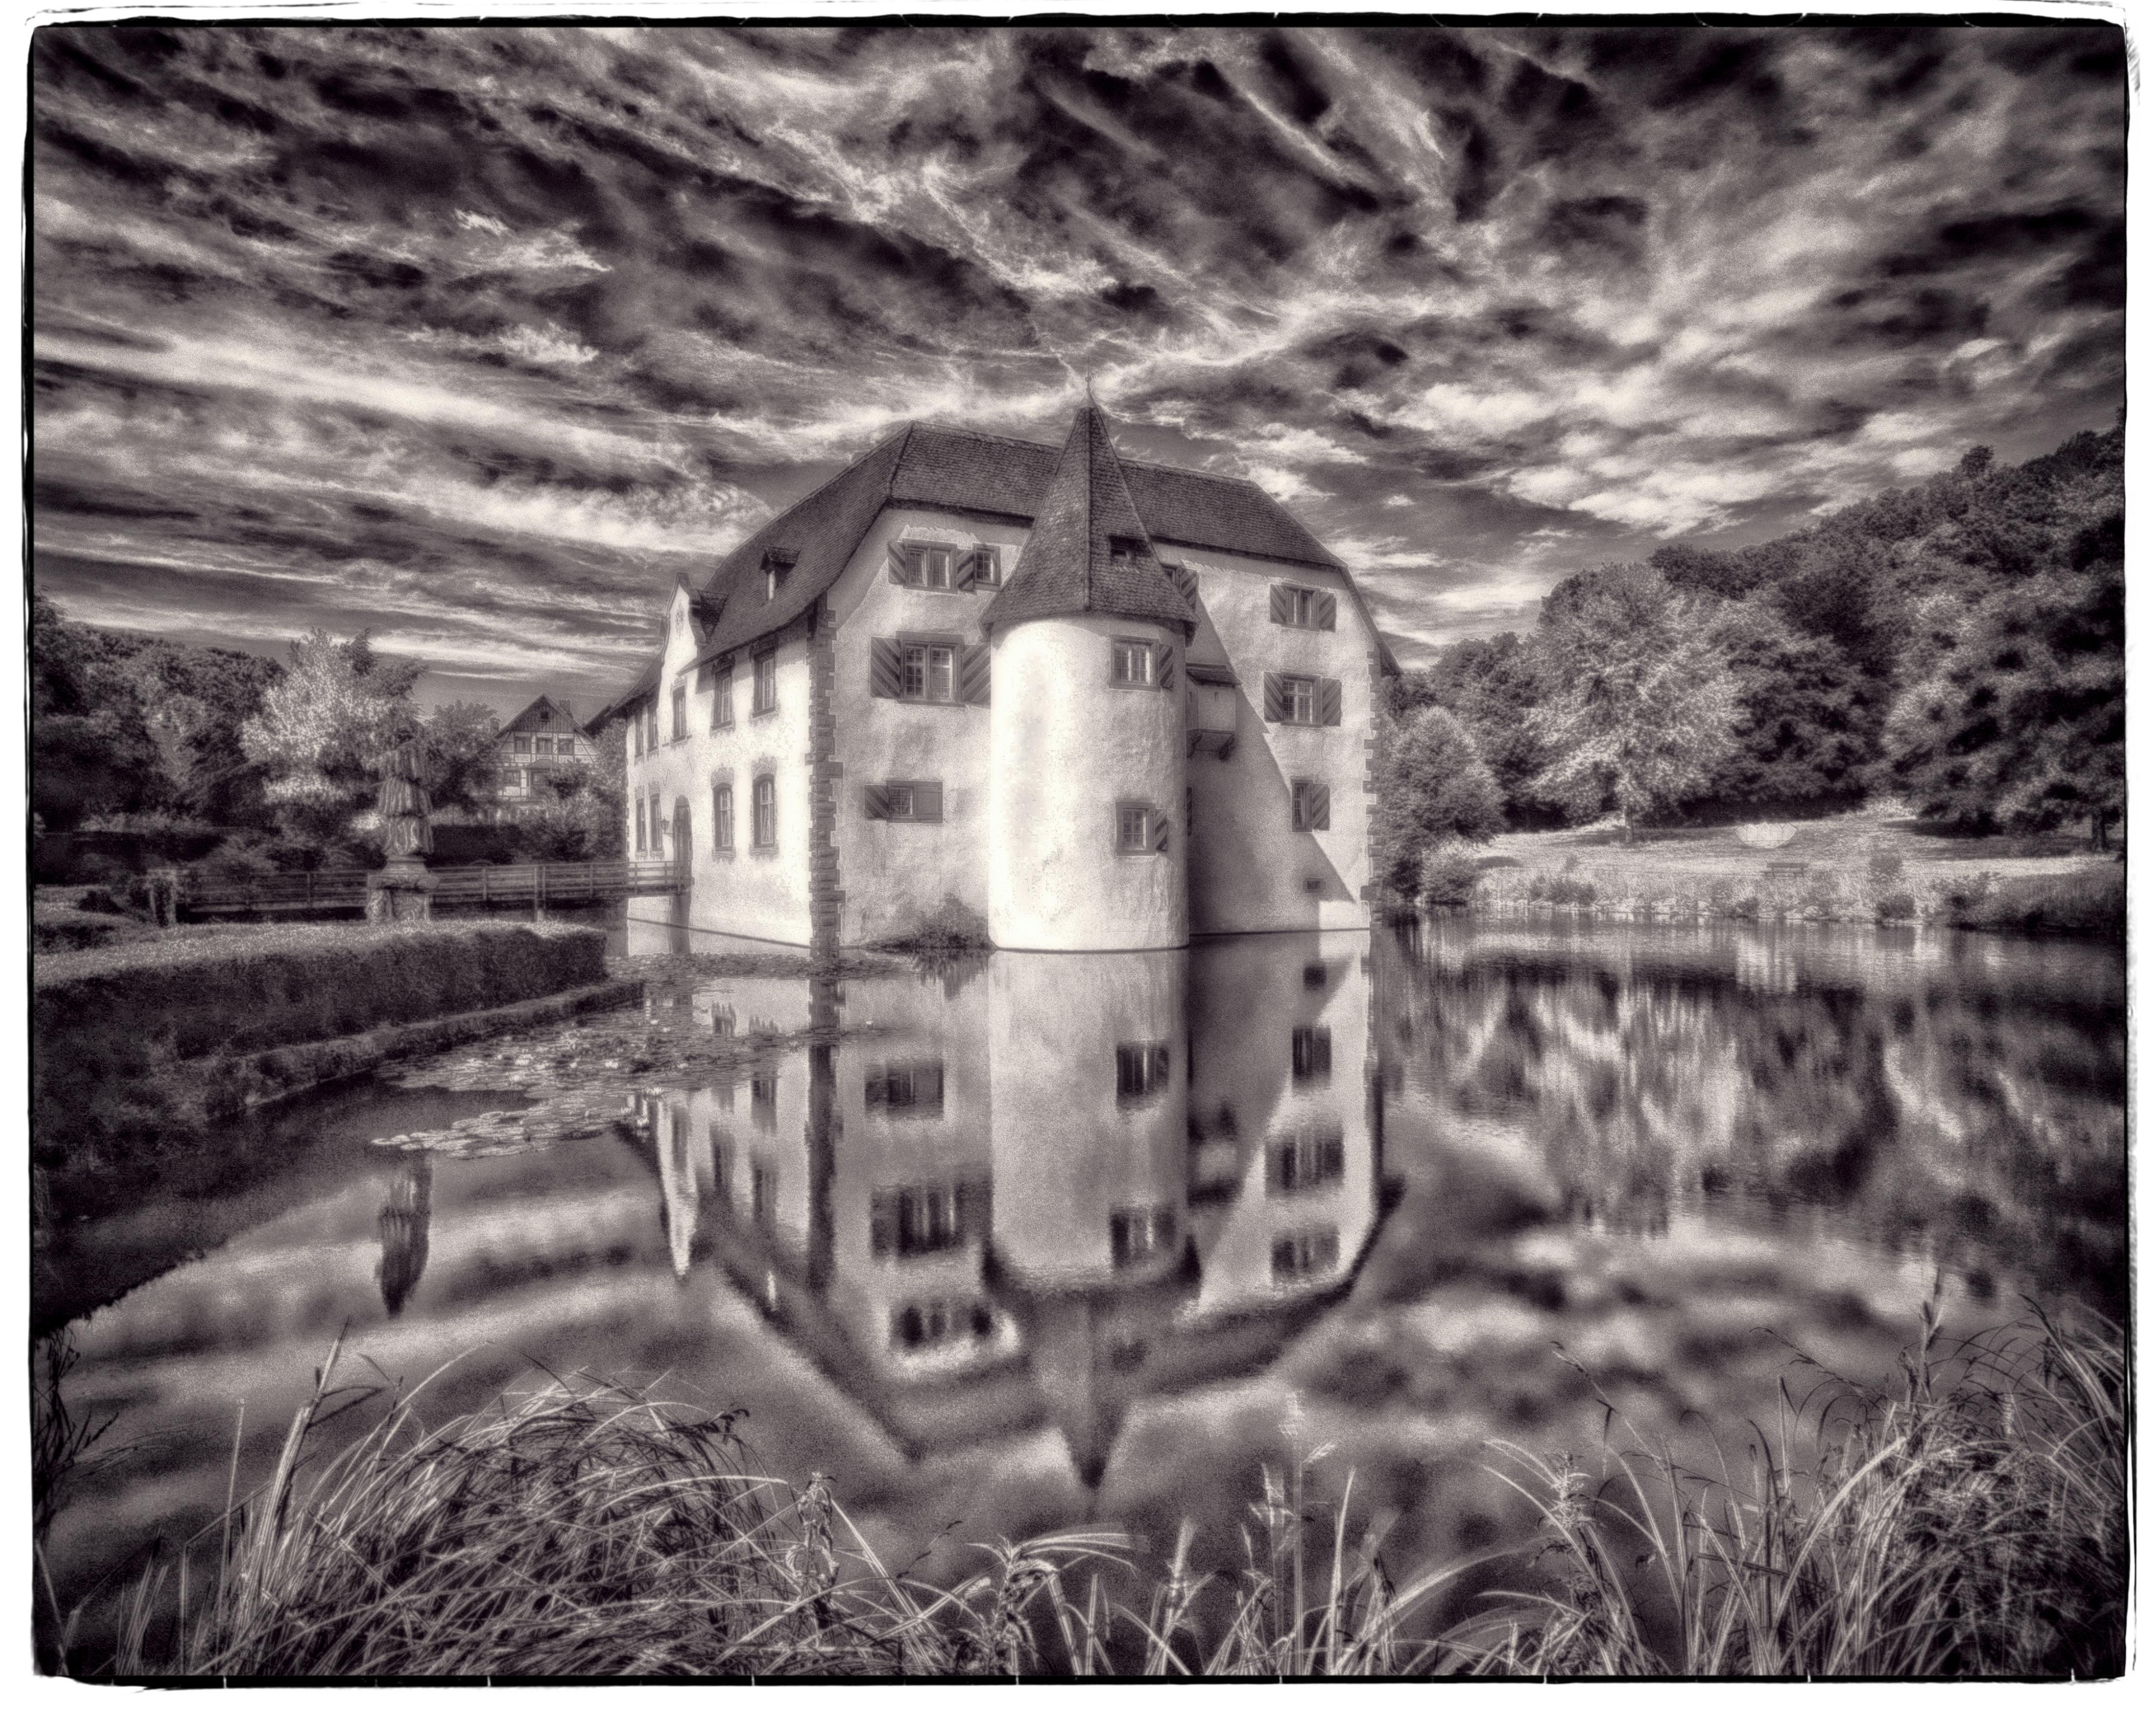 the water castle of Inzlingen